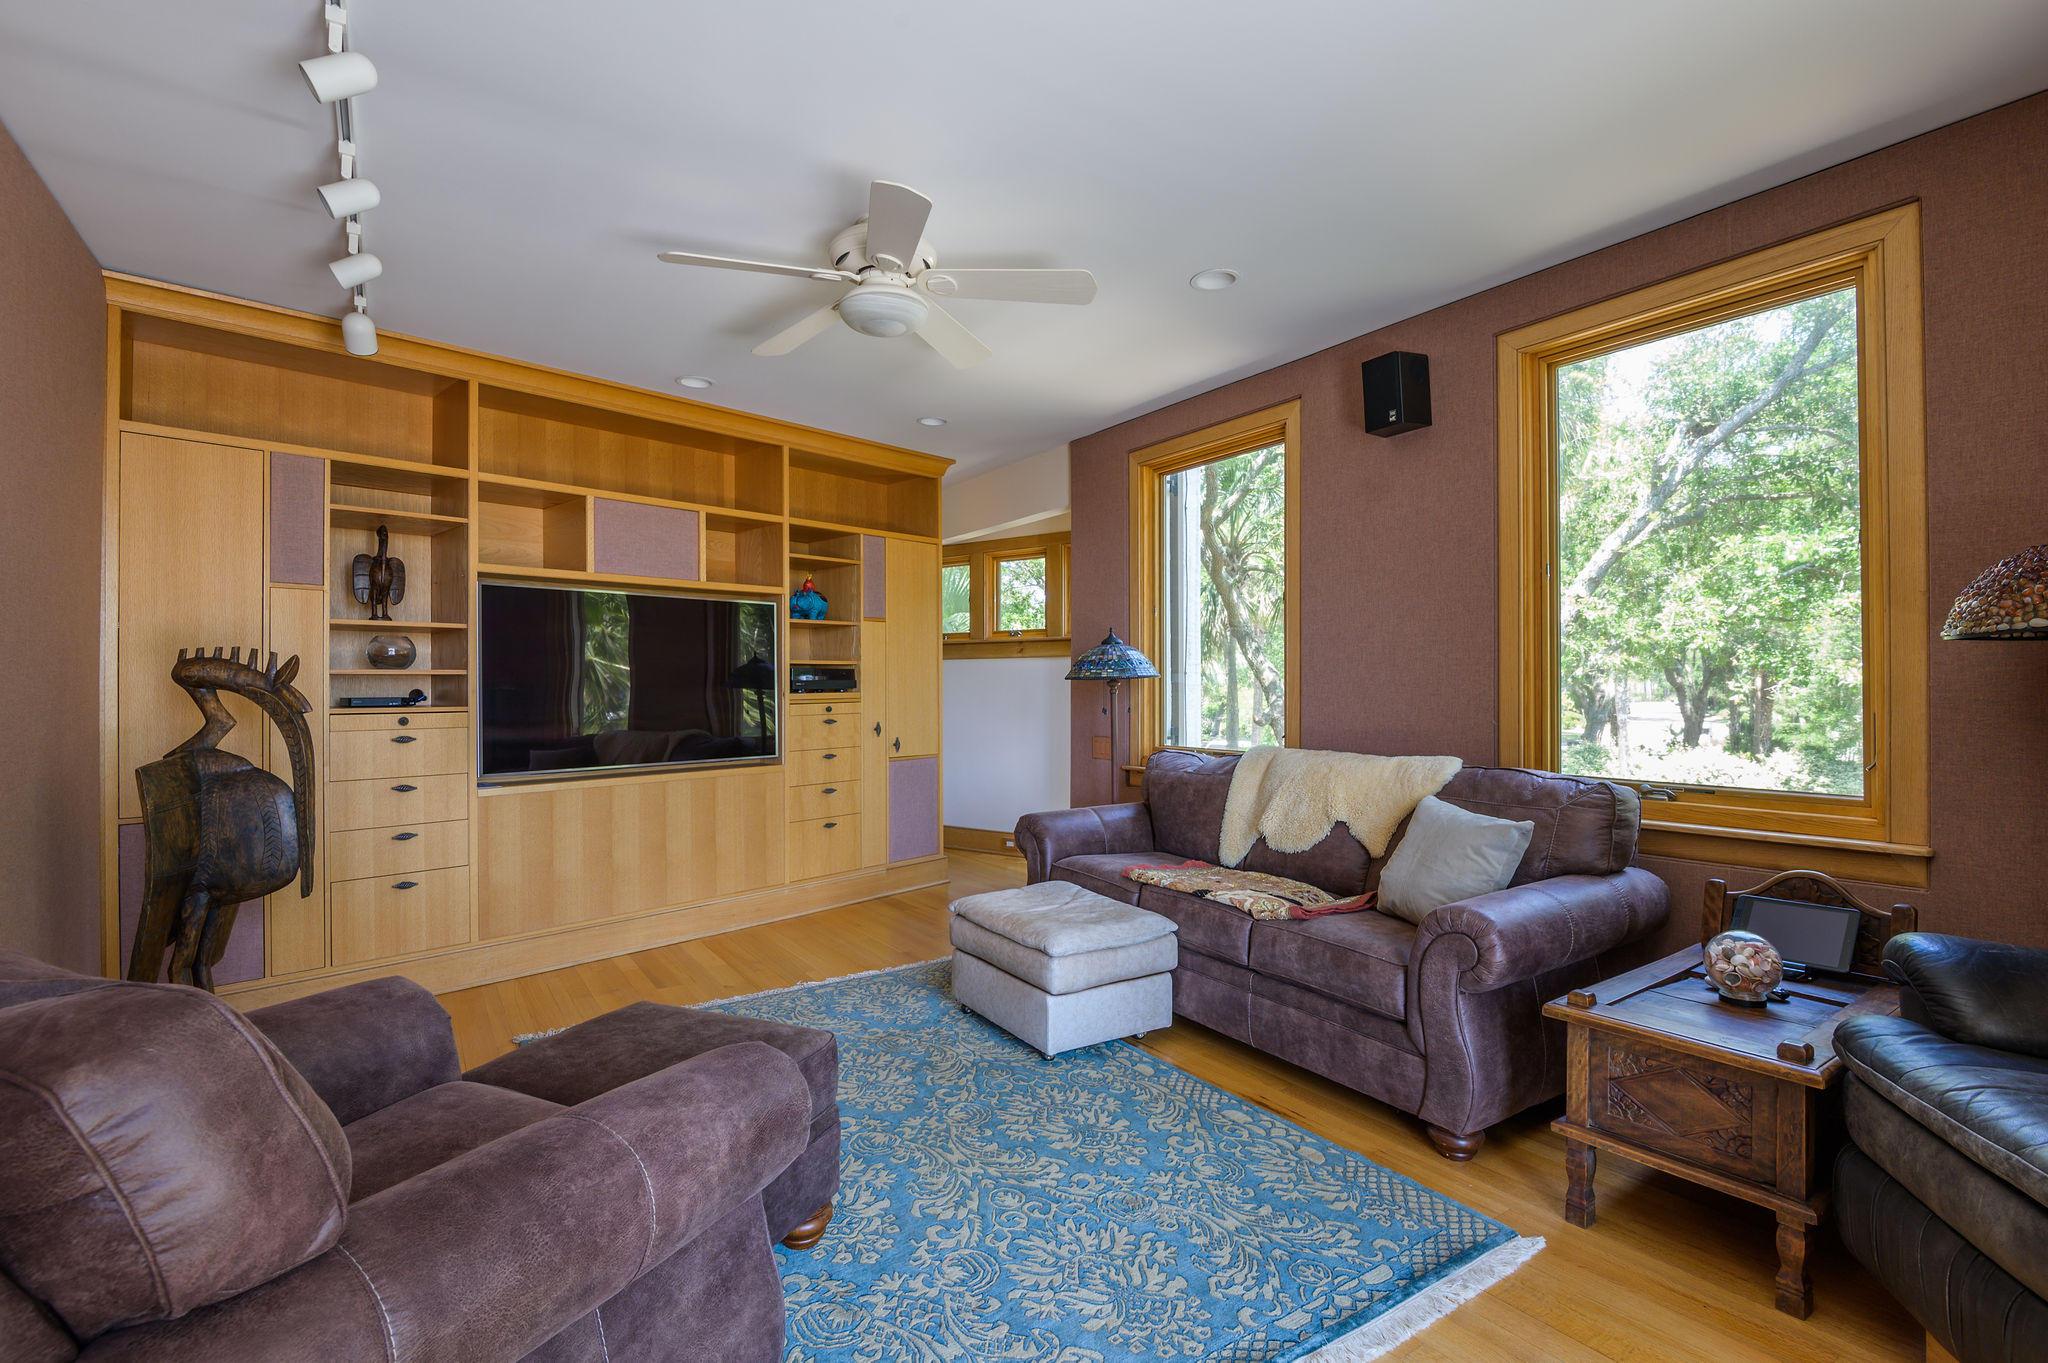 Seabrook Island Homes For Sale - 3087 Marshgate, Seabrook Island, SC - 17